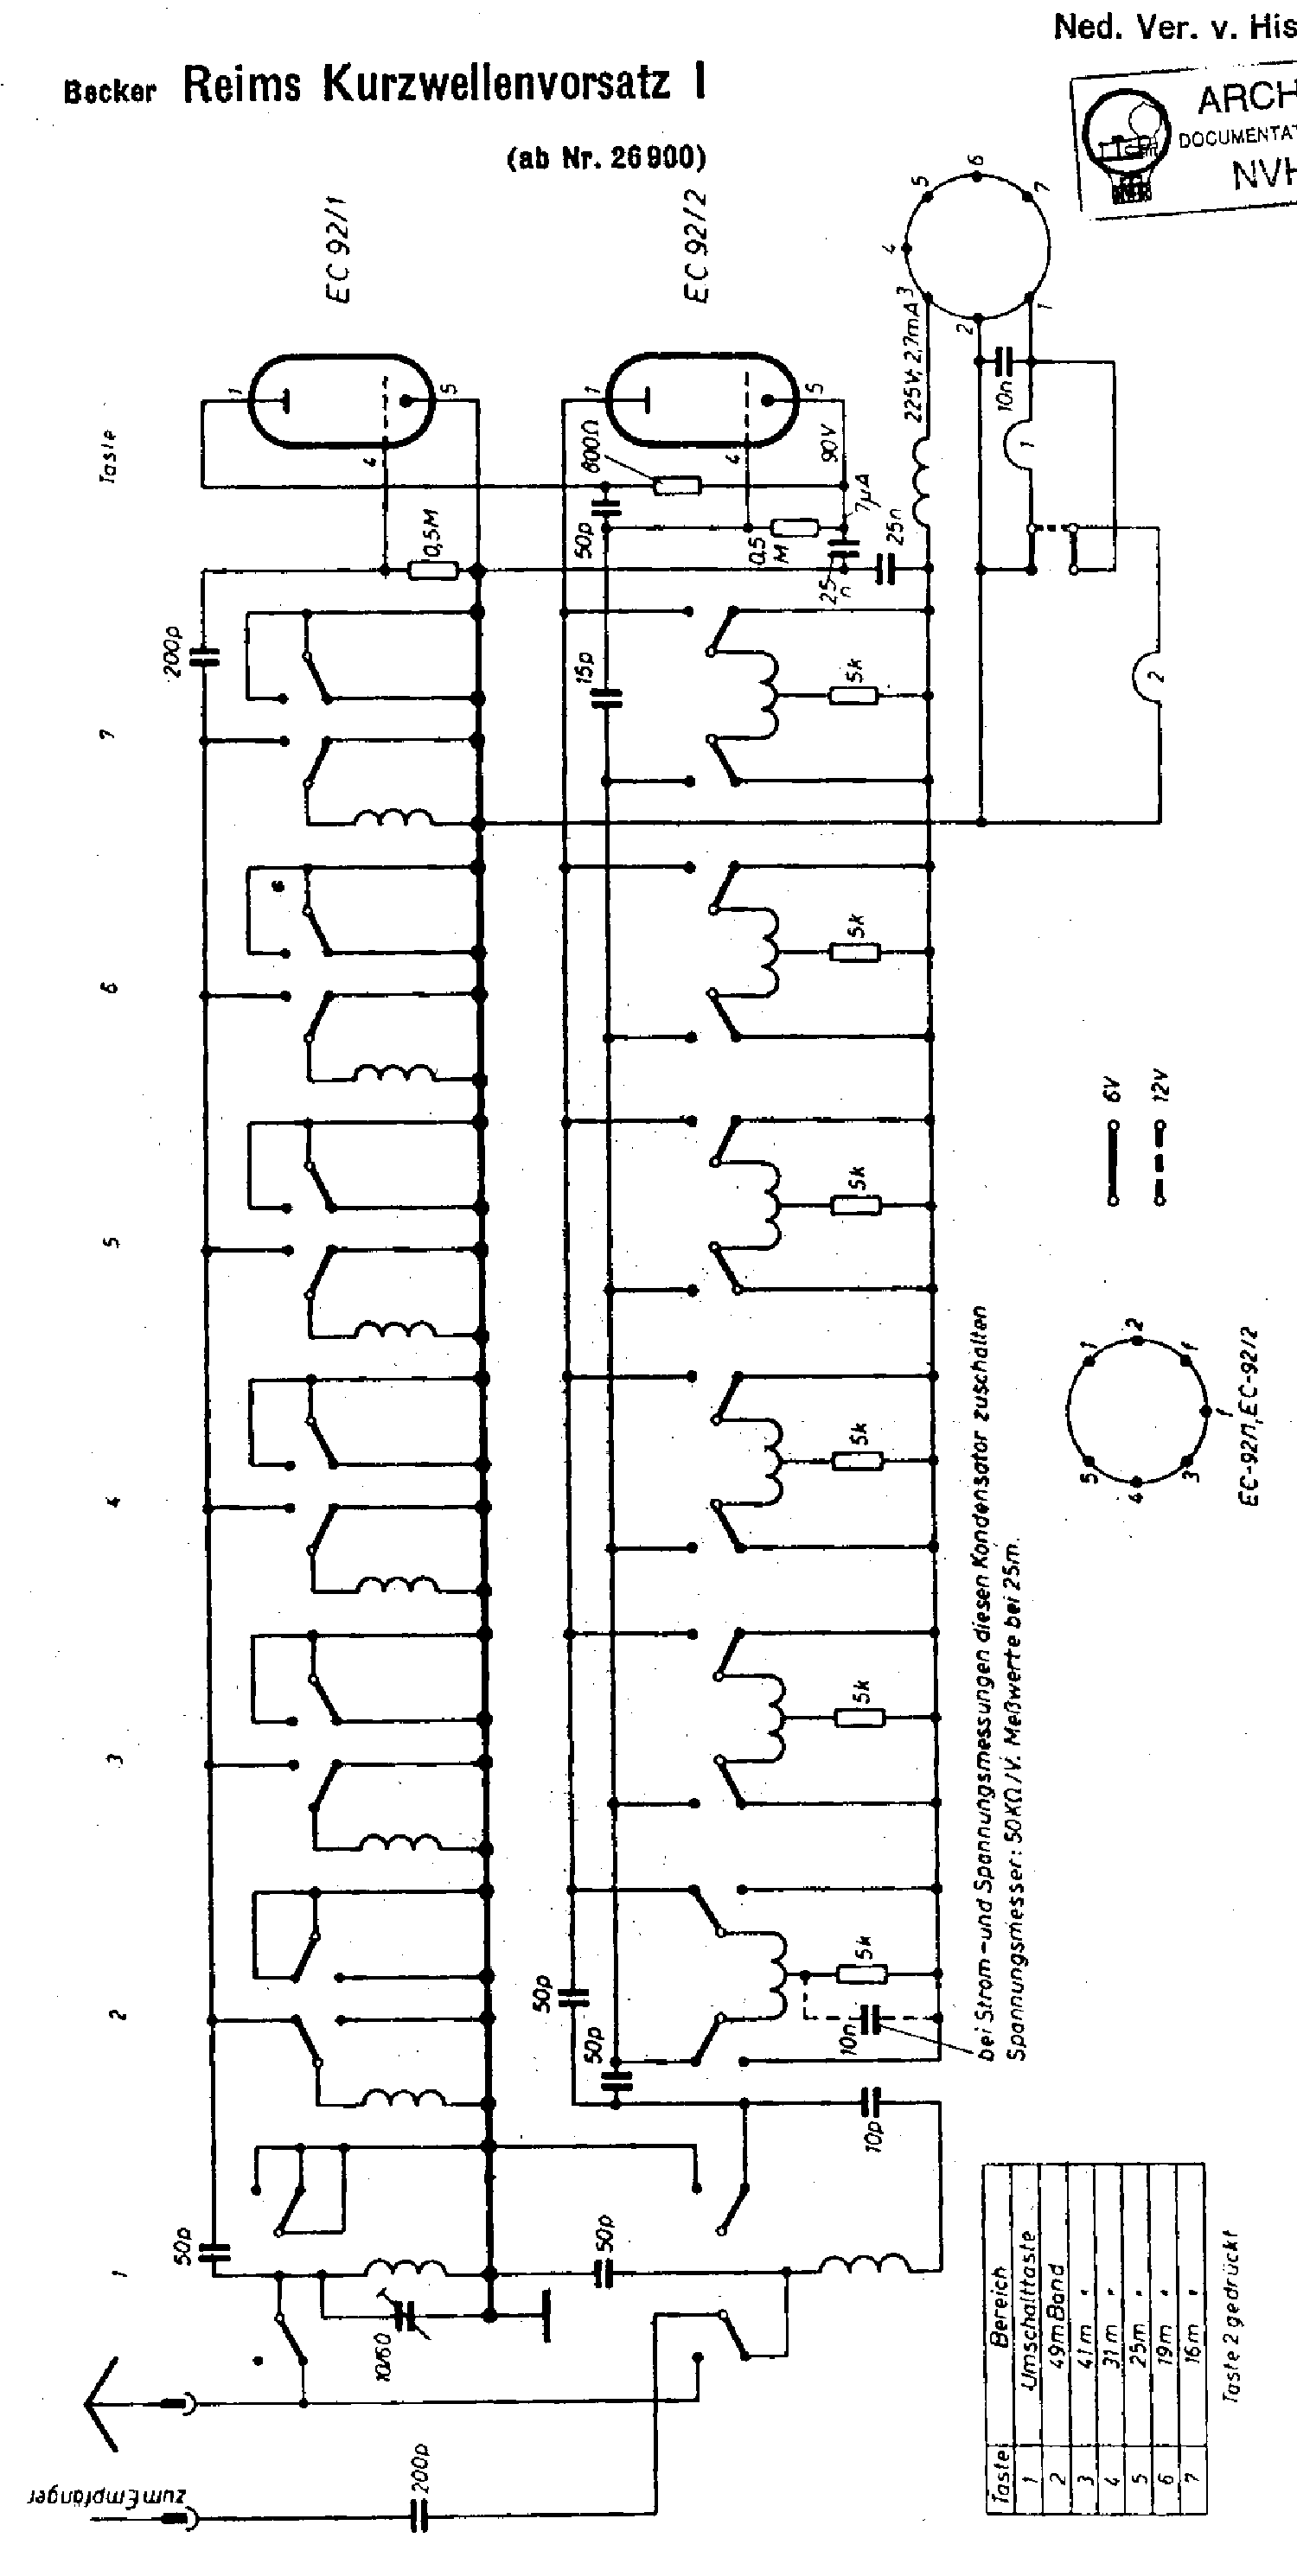 becker grand prix 1960 service manual download  schematics